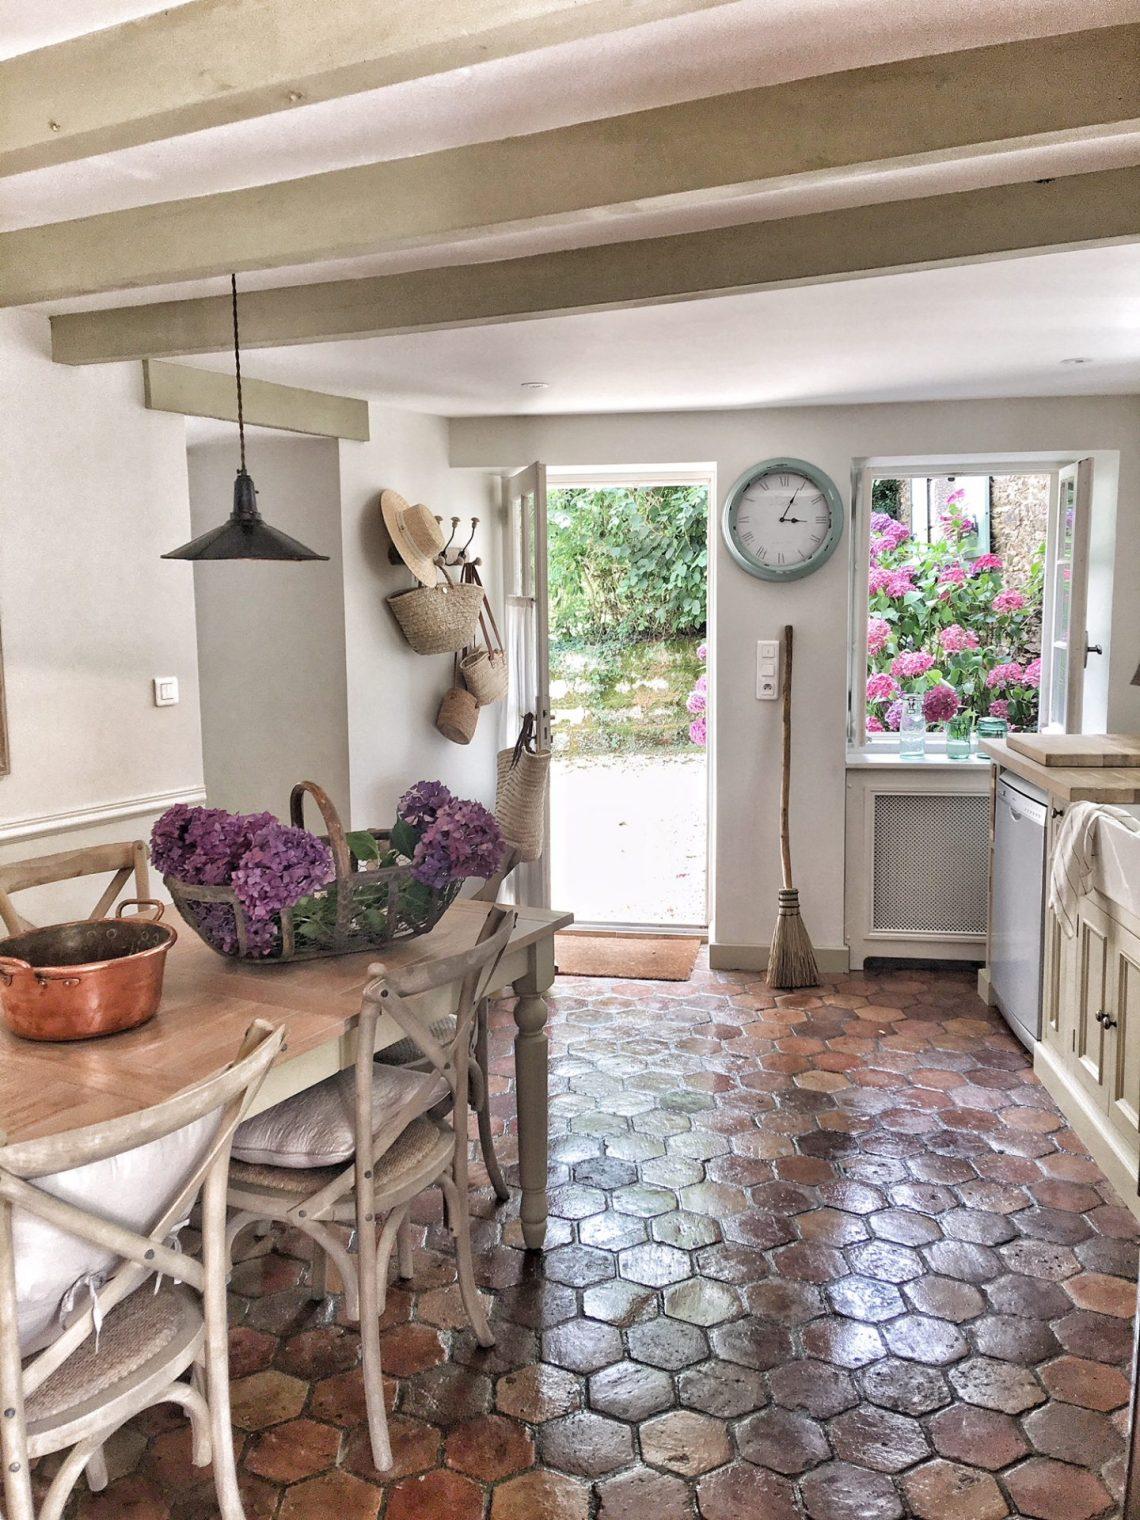 66 French Farmhouse Decor Inspiration Ideas: Part 1 ...